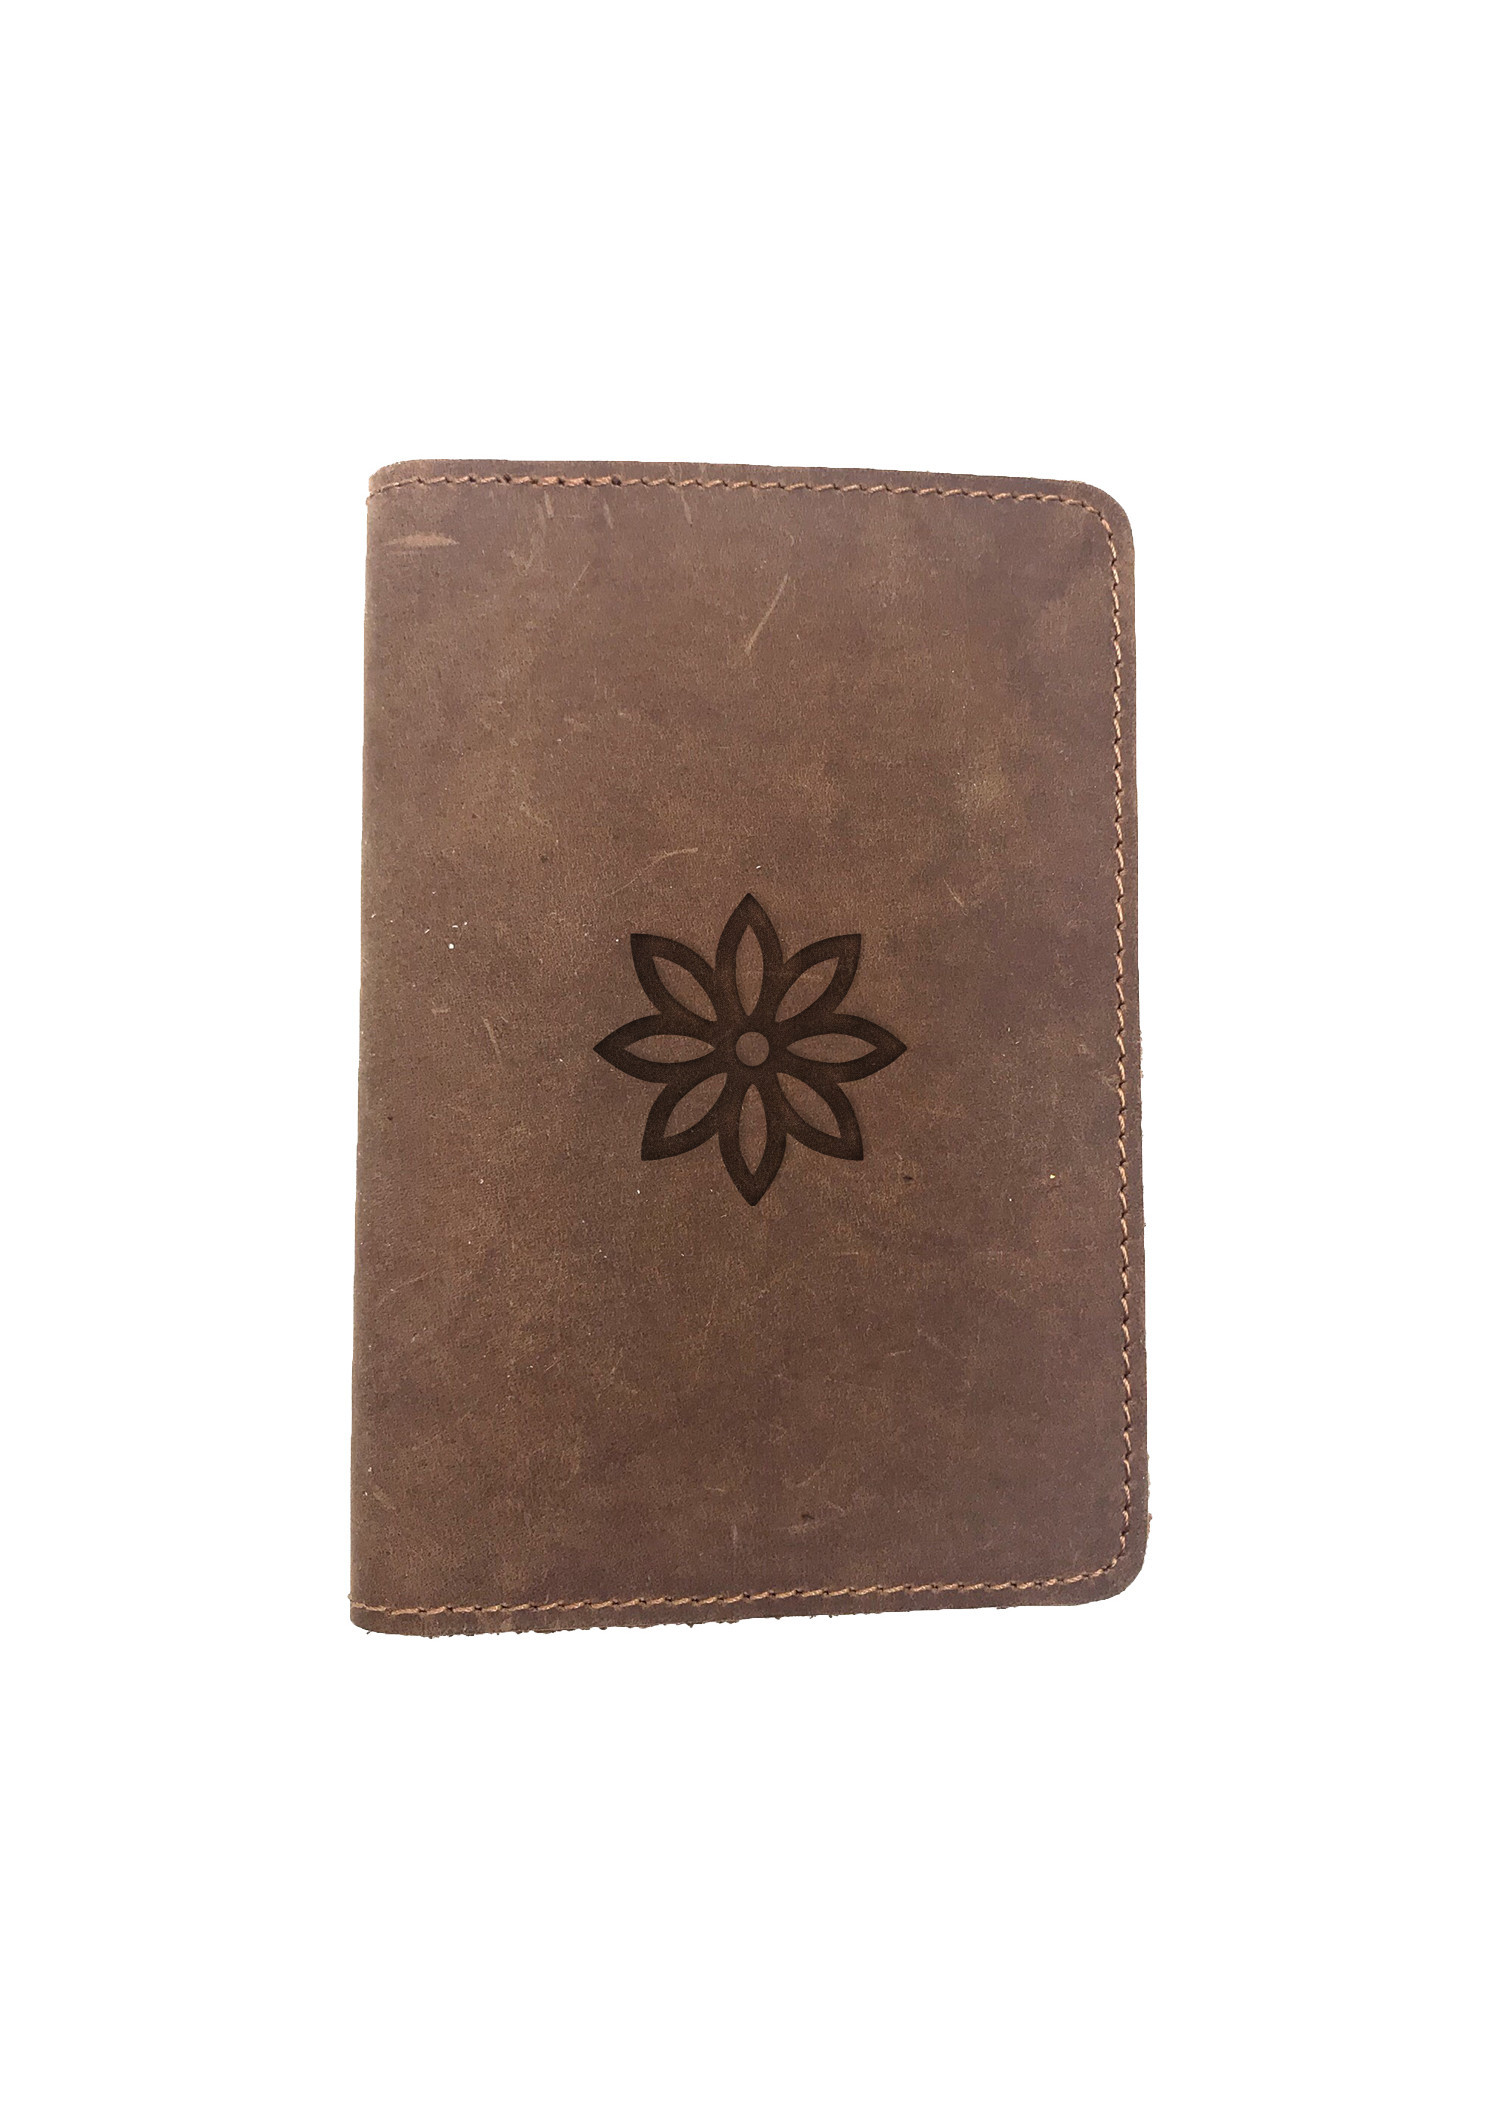 Passport Cover Bao Da Hộ Chiếu Da Sáp Khắc Hình Hoa cúc DAISY FLOWER (BROWN)